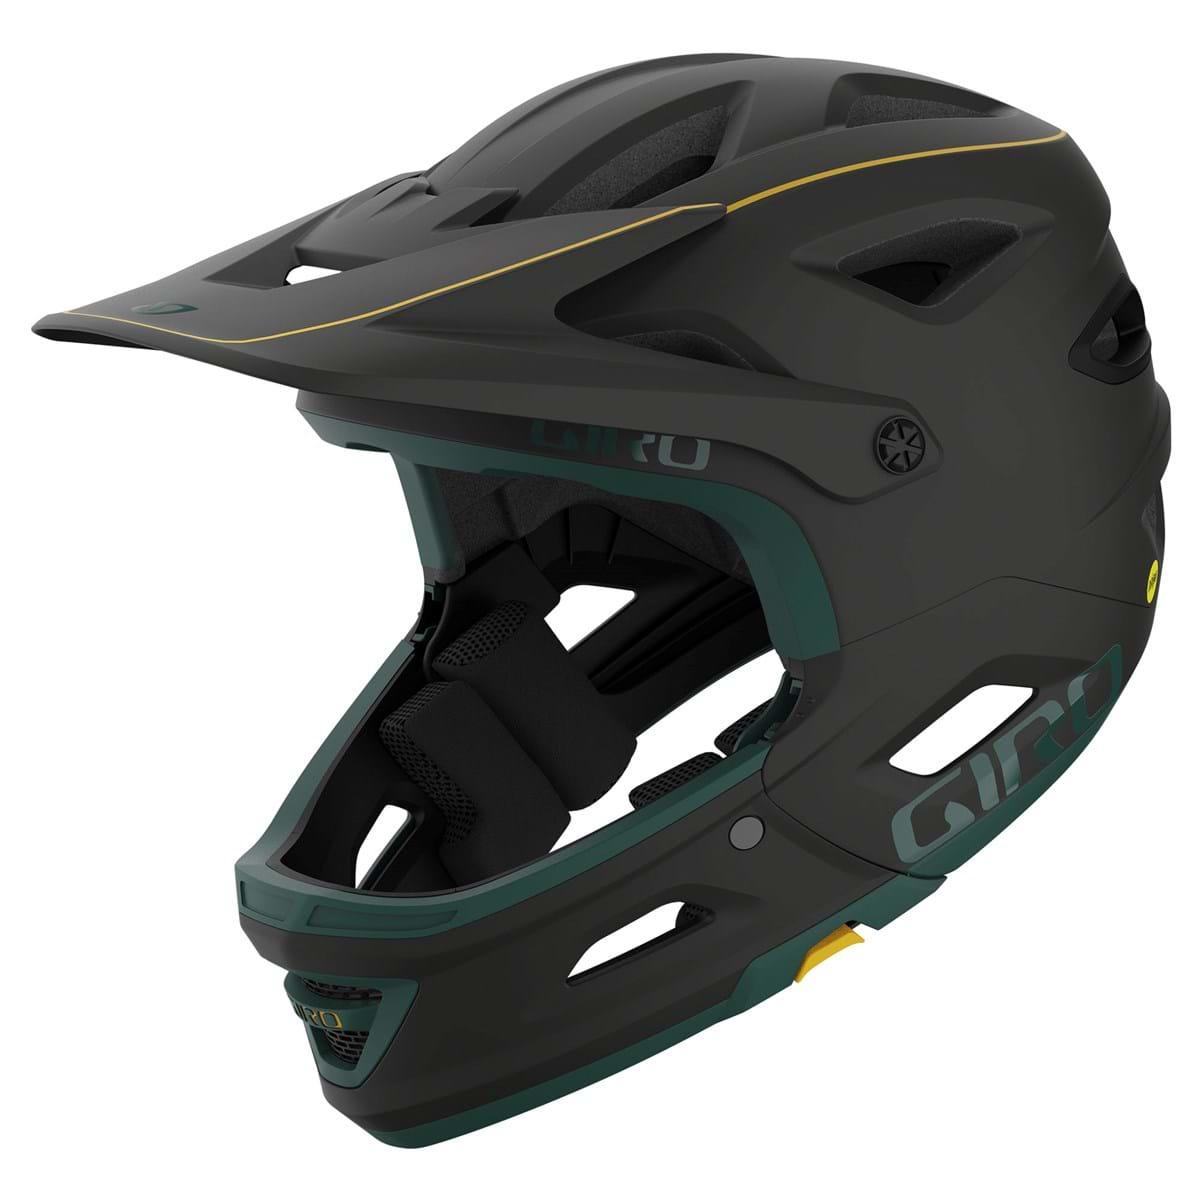 Switchblade MIPS Dirt/MTB Helmet